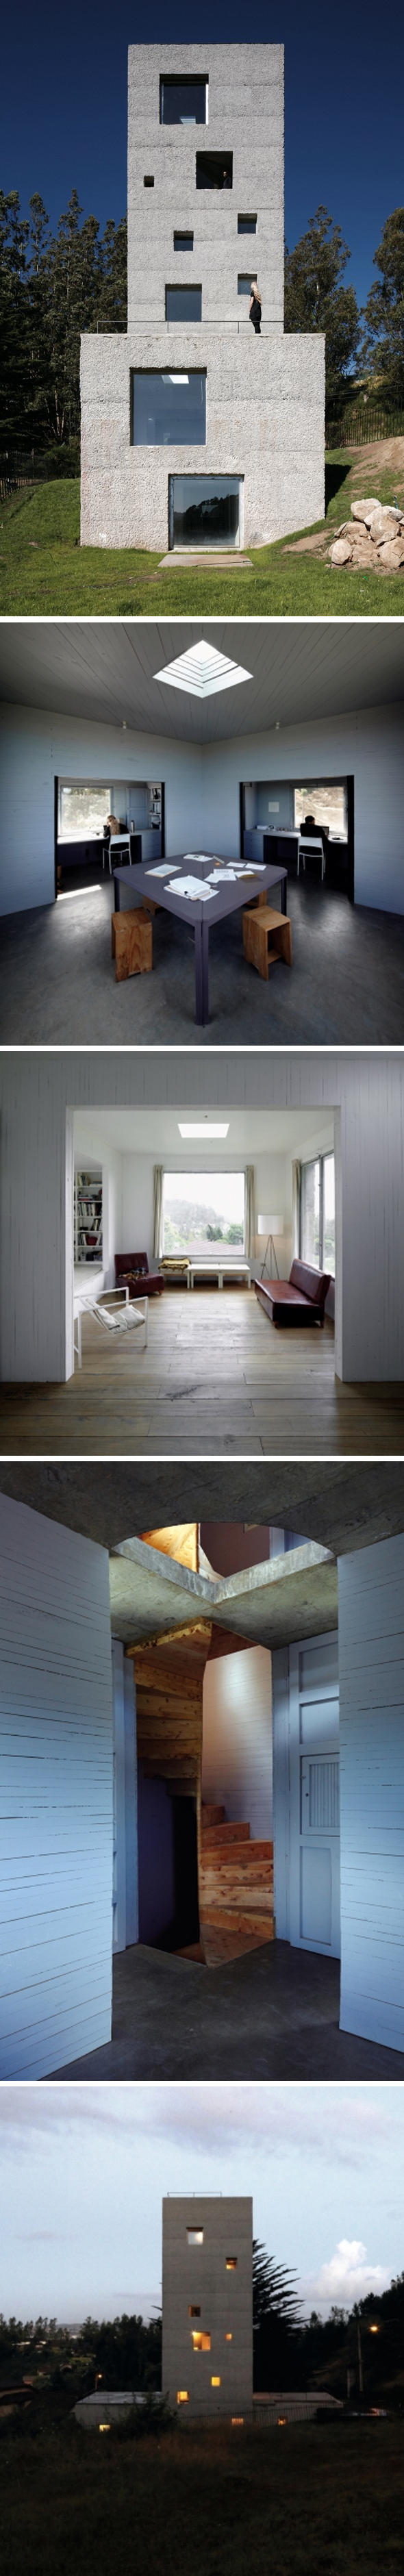 Cien House Par Mauricio Pezo And Sof A Von Ellrichshausen Pezo  # Muebles Tomas Irribarra